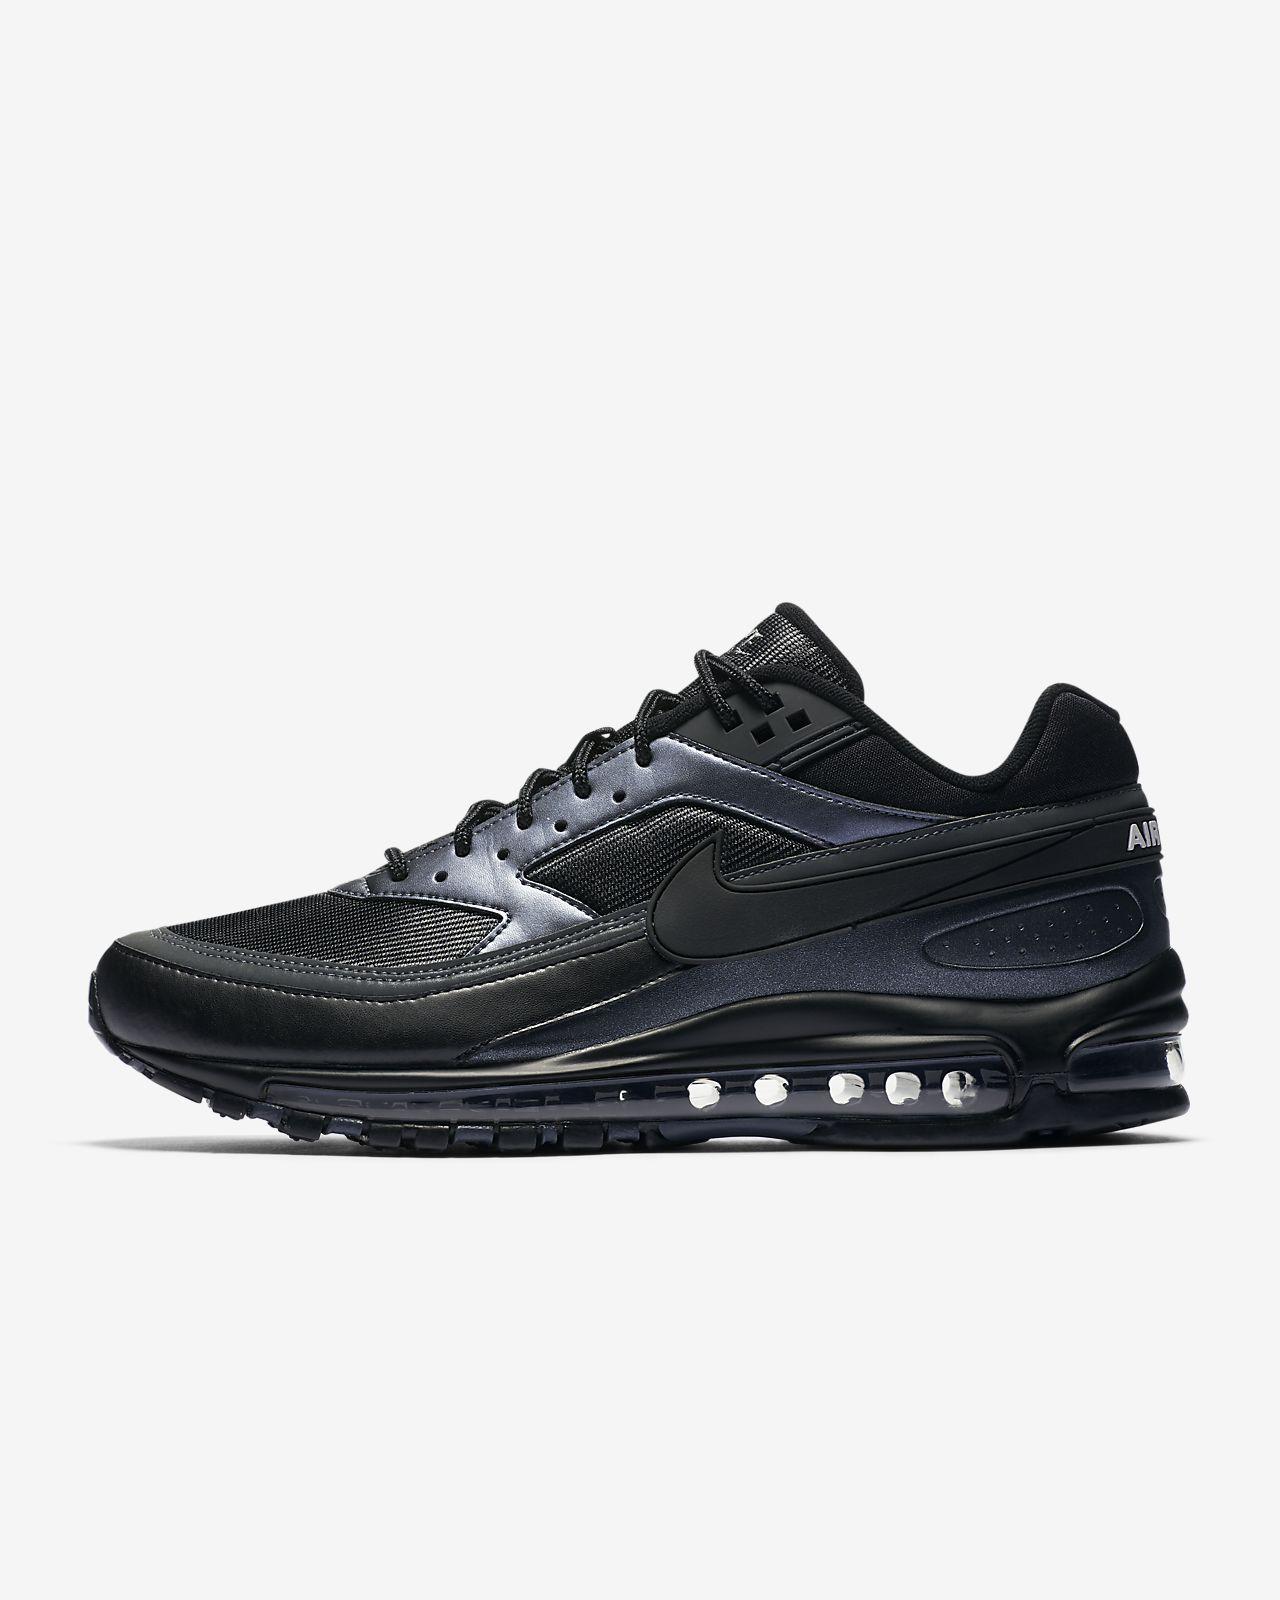 Nike Fr Chaussure Max Pour Air Homme 97bw qTvwzd